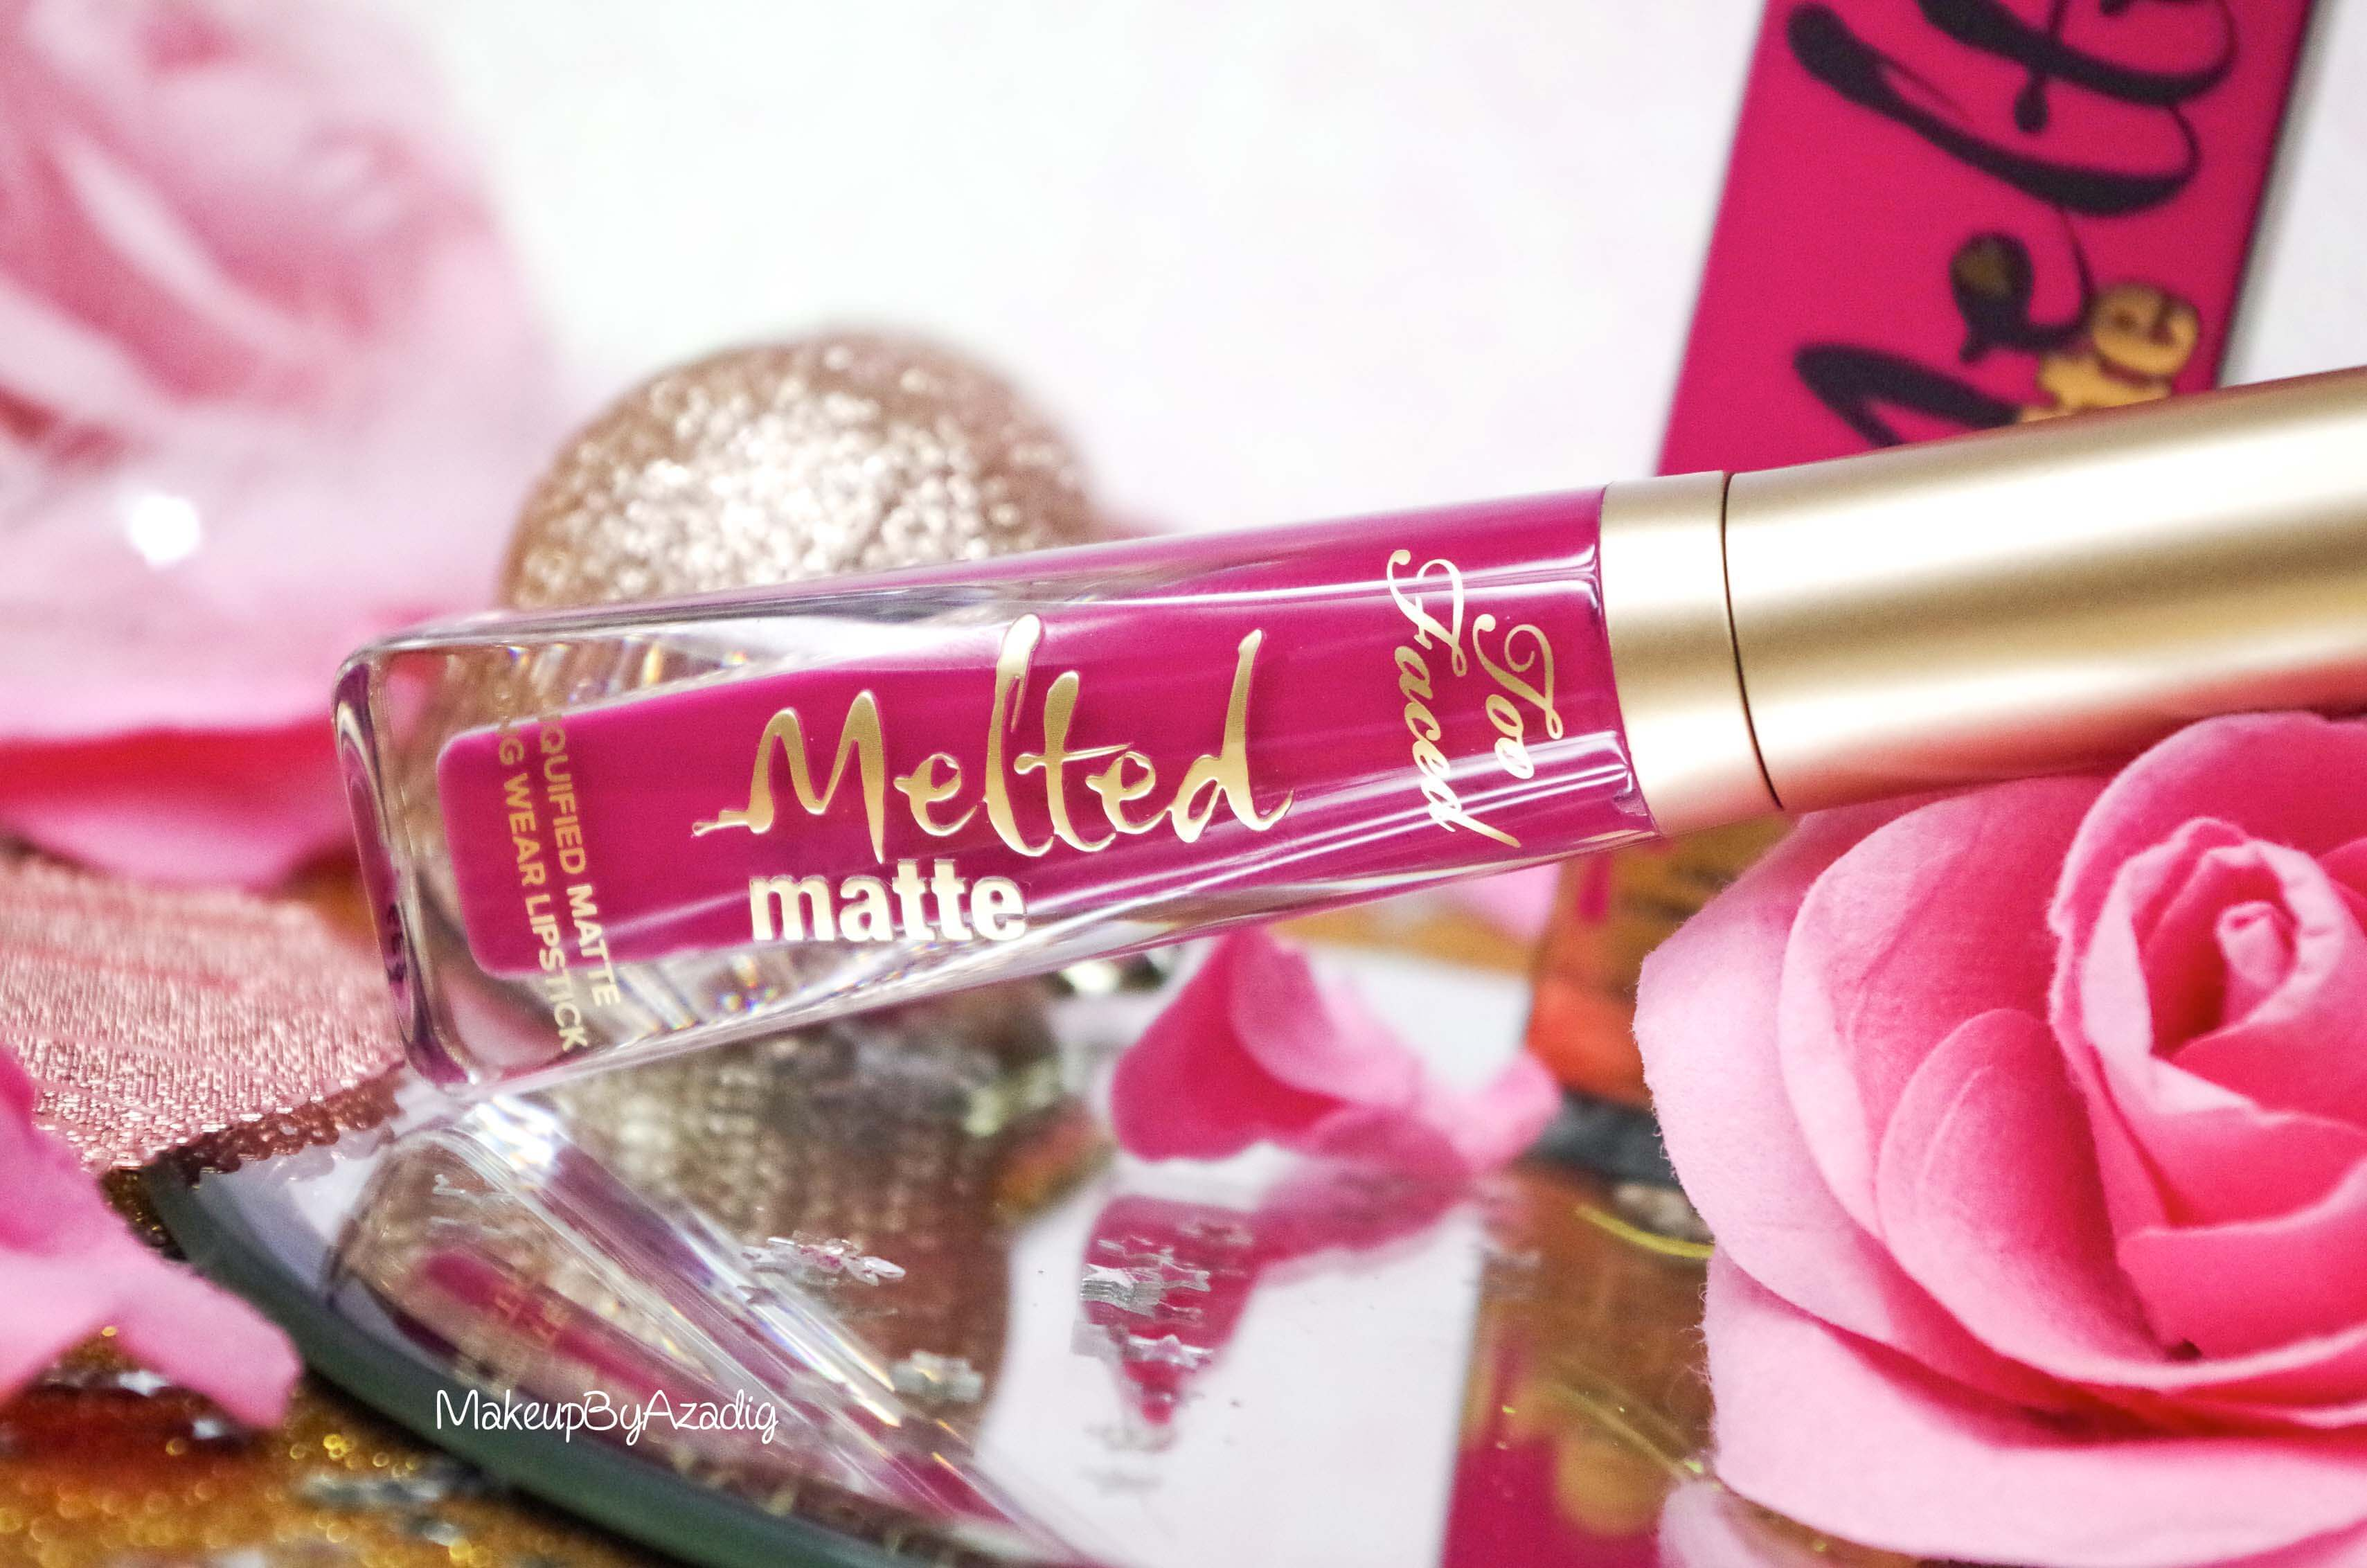 makeupbyazadig-melted-matte-queenb-bendandsnap-influencer-too-faced-rouge-levres-revue-avis-prix-sephora-paris-blog-liquide-dream